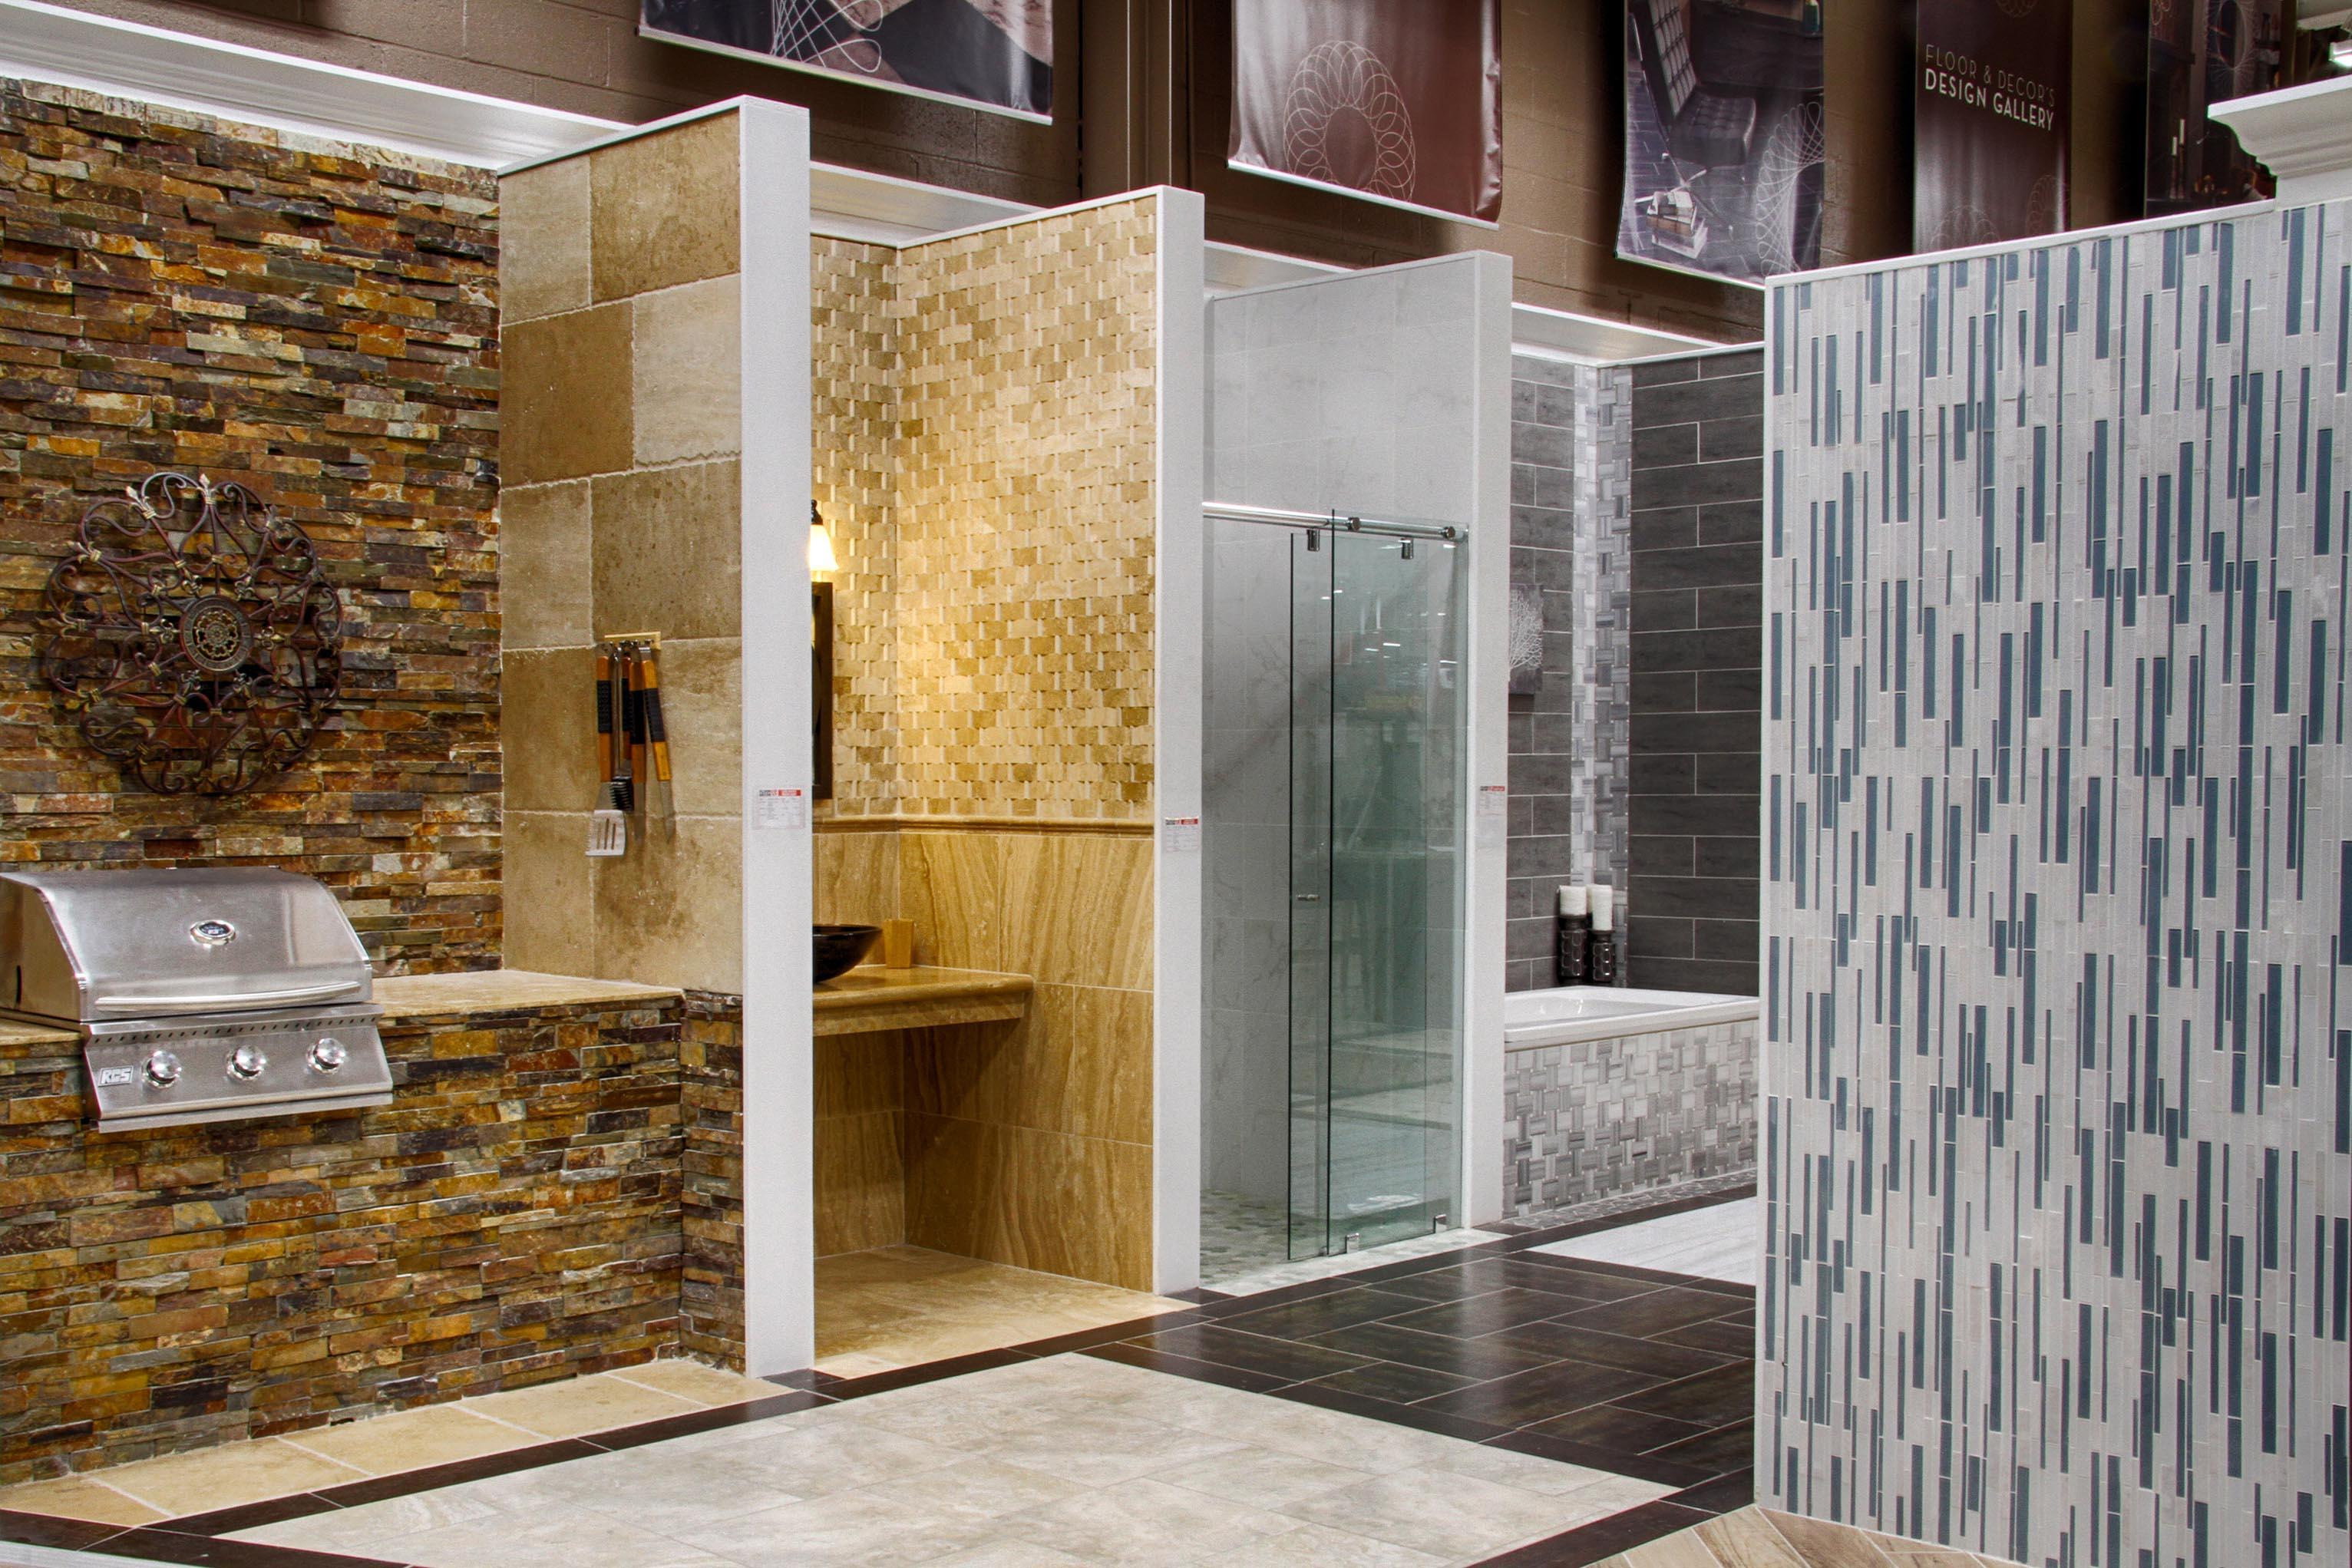 Devon Stone Black Feature Floor Tile 33x33cm In 2019: The Top 20 Ideas About Floor And Decor Devon